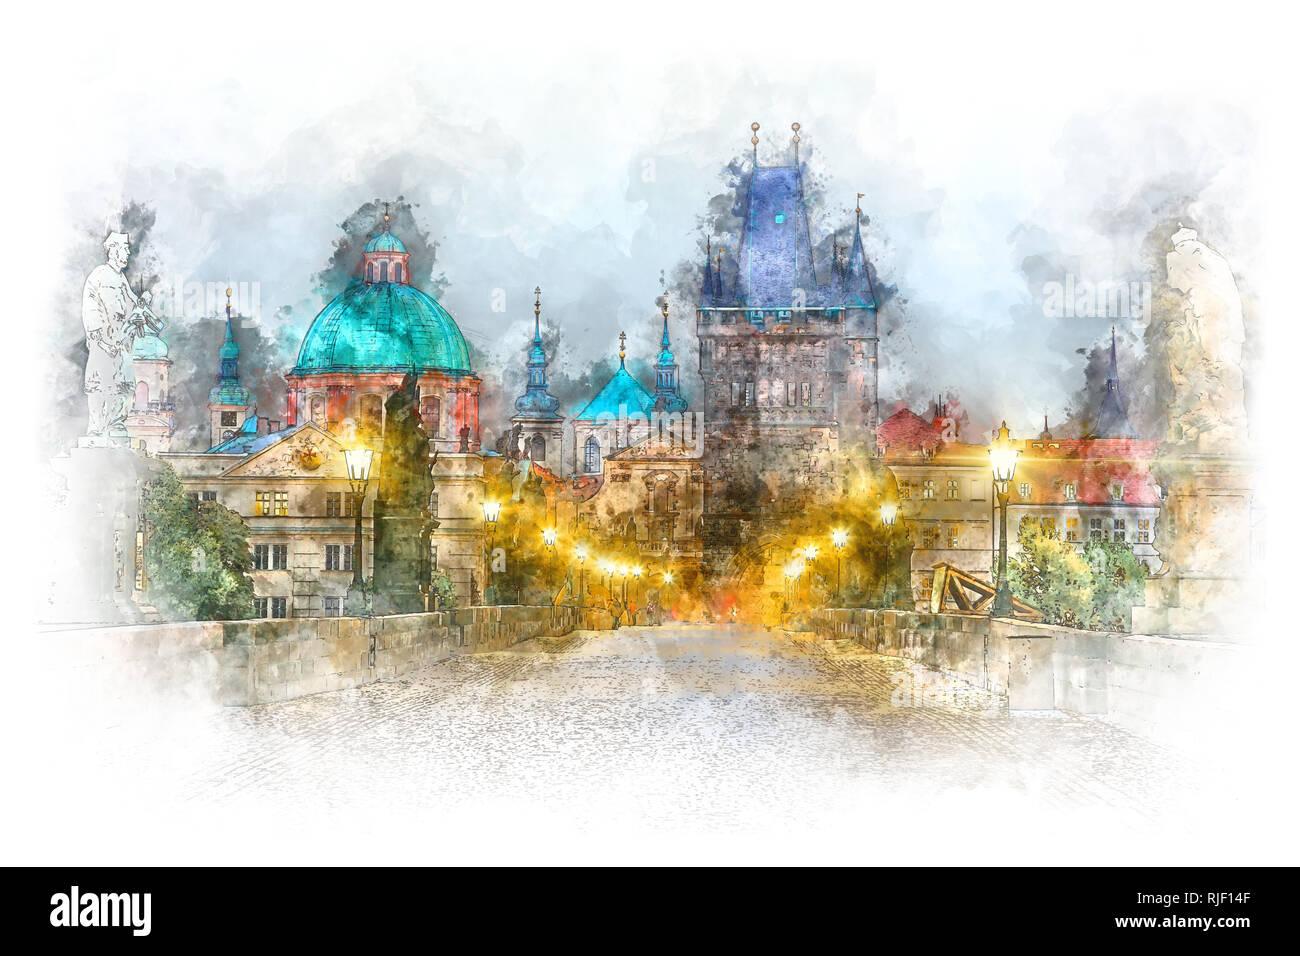 Prague - famous landmark Charles Bridge with illumination, watercolor artwork. Czech, Europe - Stock Image